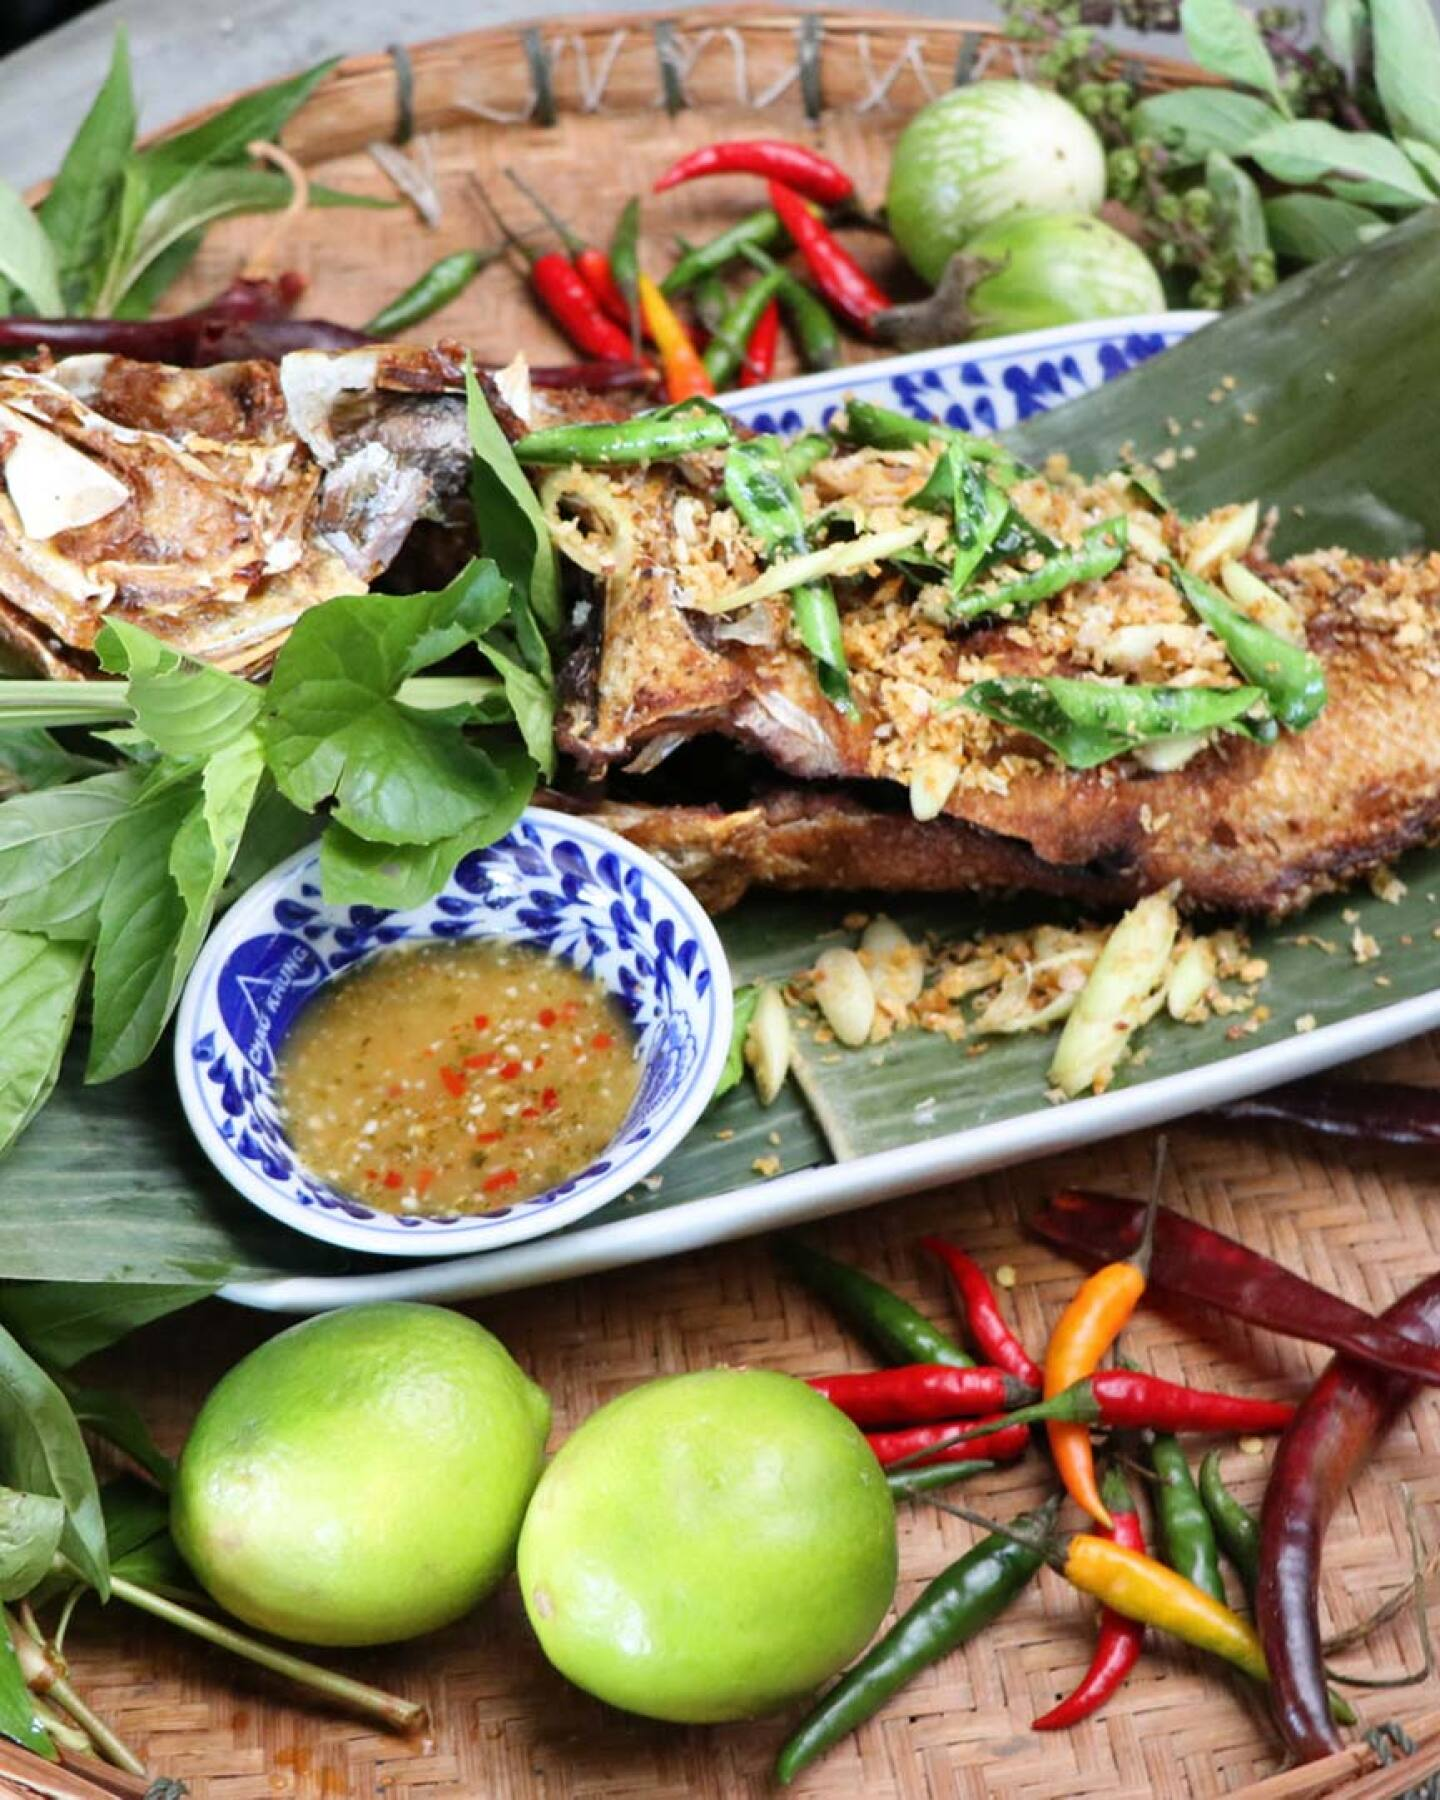 Pla Gra-taem (Garlic Fish) from Chao Krung | Courtesy of Chao Krung